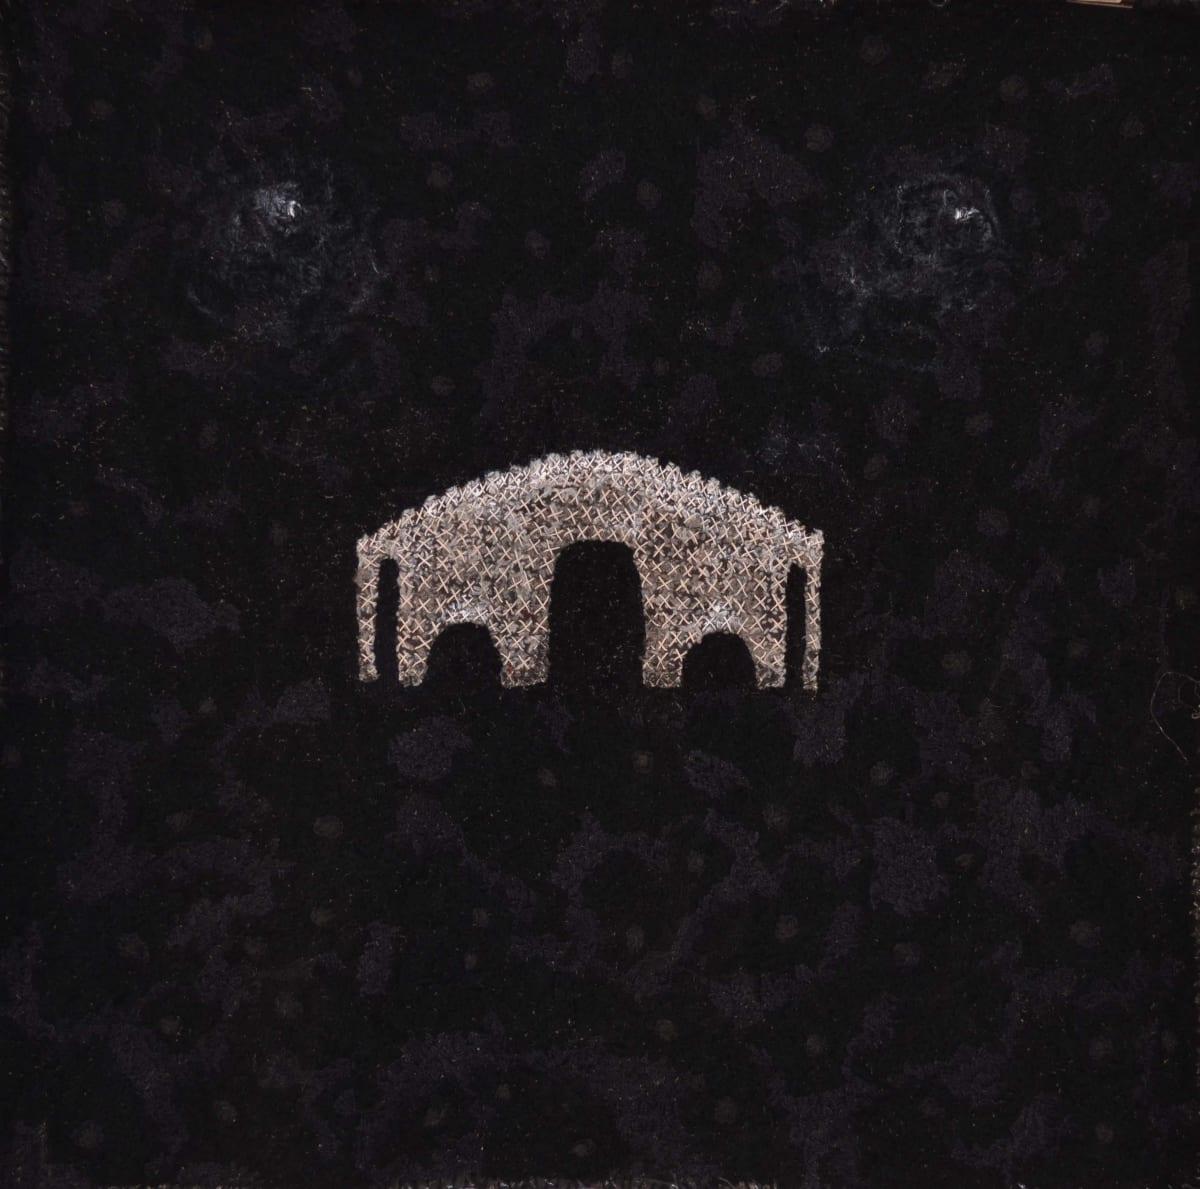 Stephen Eastaugh Bridge and Black Holes (Norway) acrylic, thread, linen 140 x 130 cm